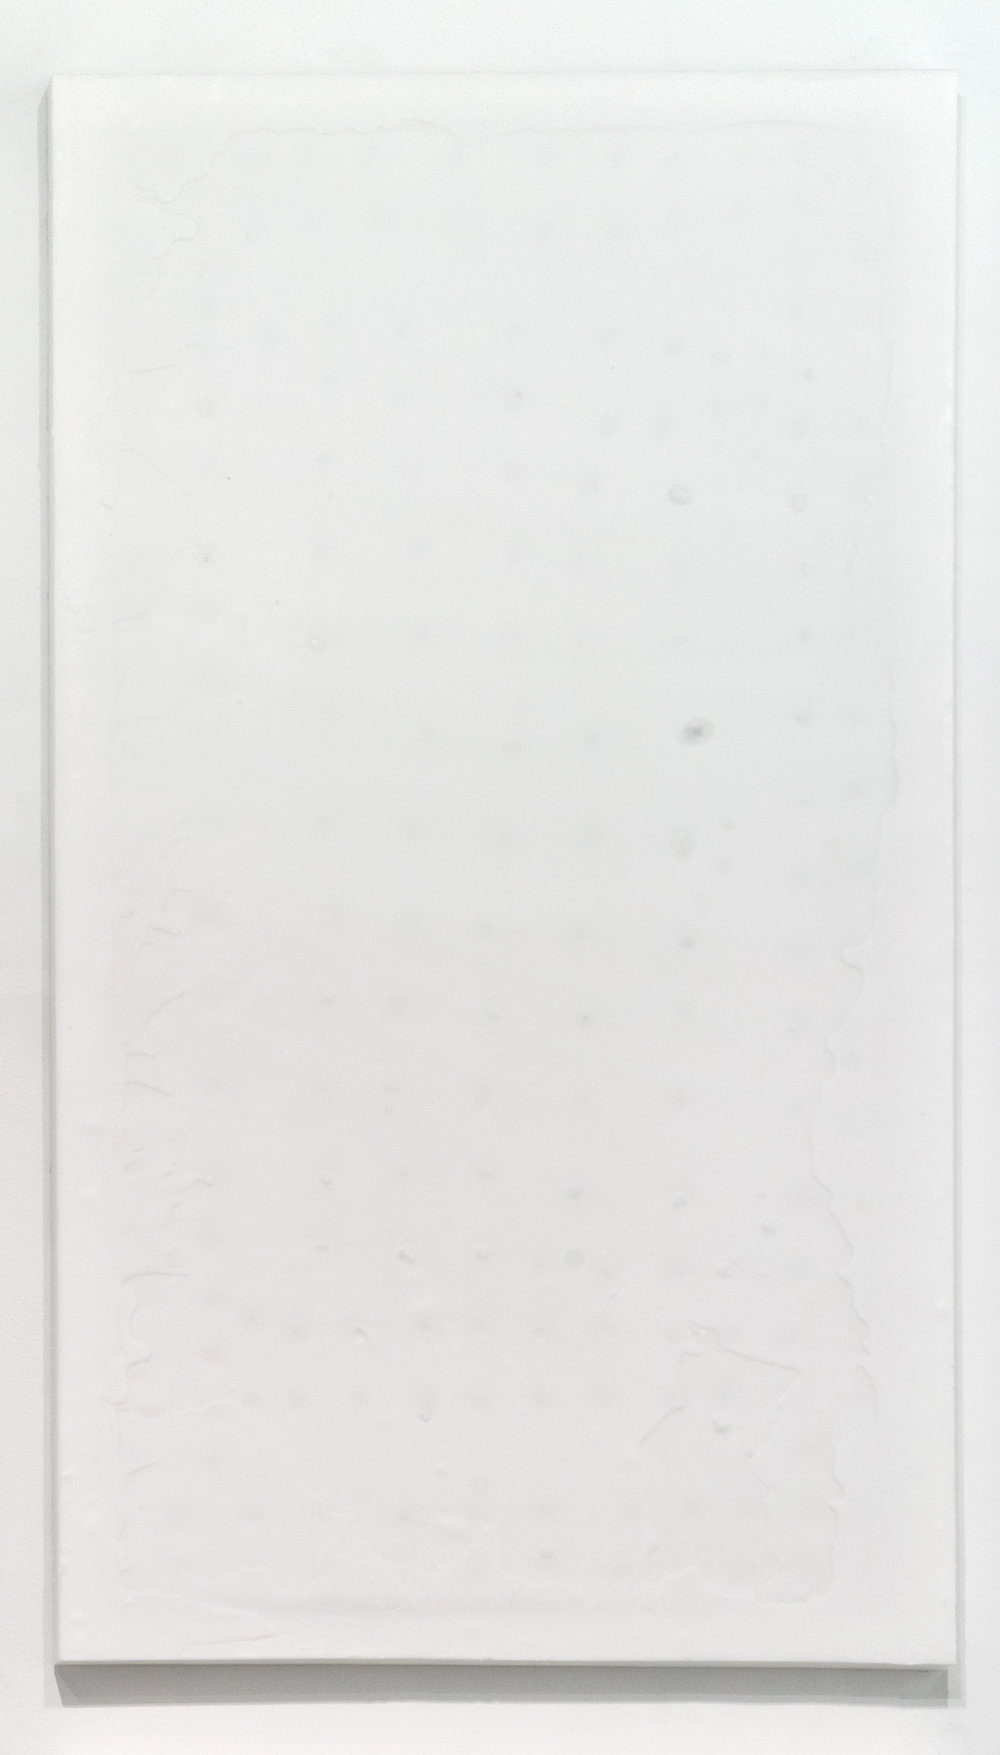 Soft Picture (Reverse Cast Exxon Slack Wax 75:493644; December 5, 2012–March 17, 2013, Miami Beach, Florida)    2012   Petroleum wax and wood strainer  90 x 50 inches   The Endless Renaissance, 2012